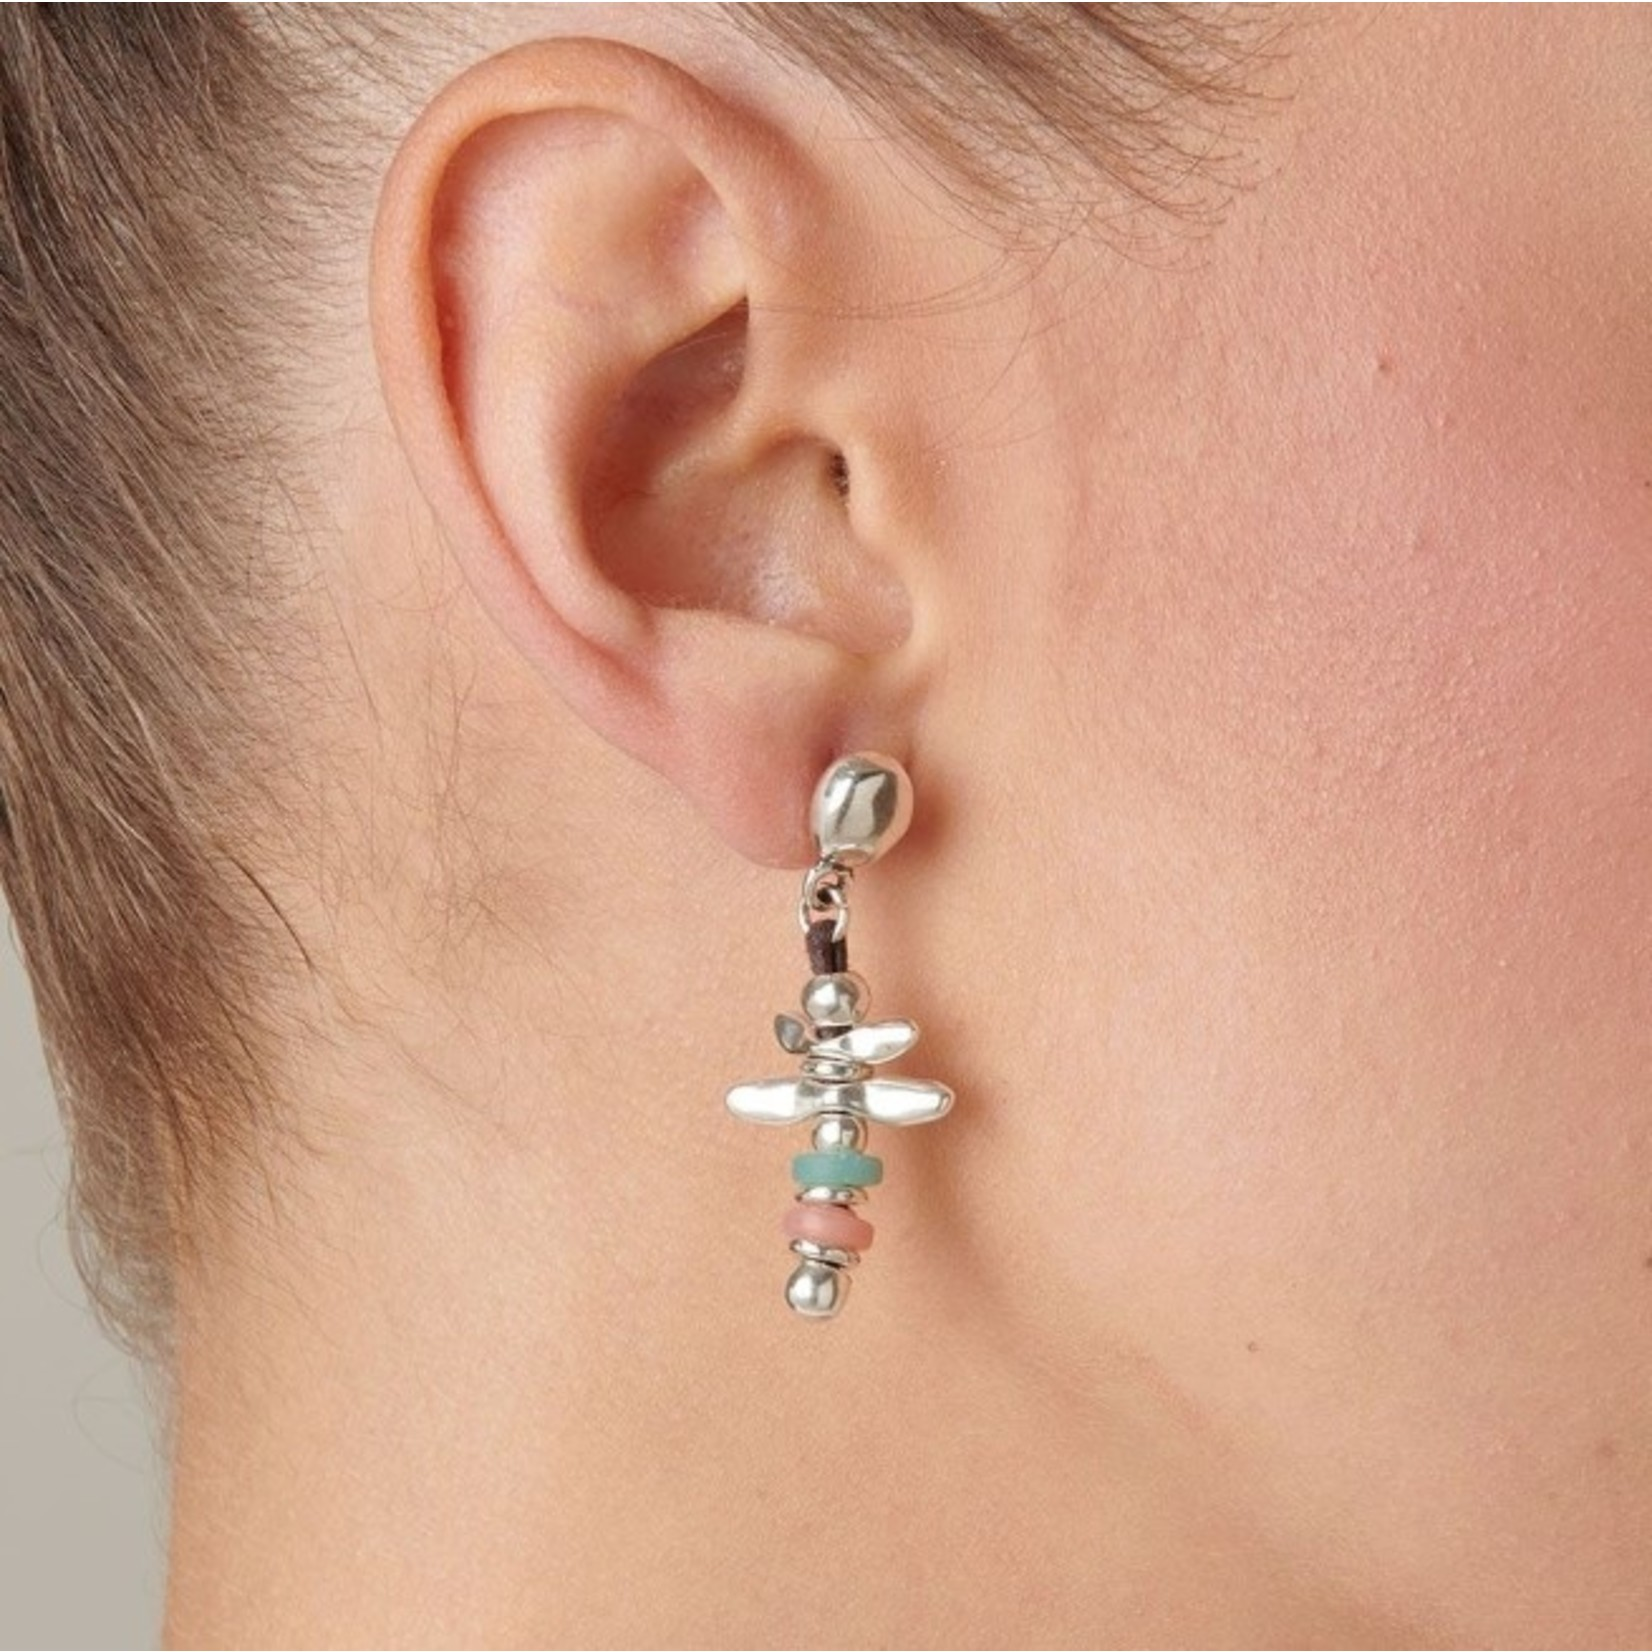 Uno de 50 All The Time Earrings